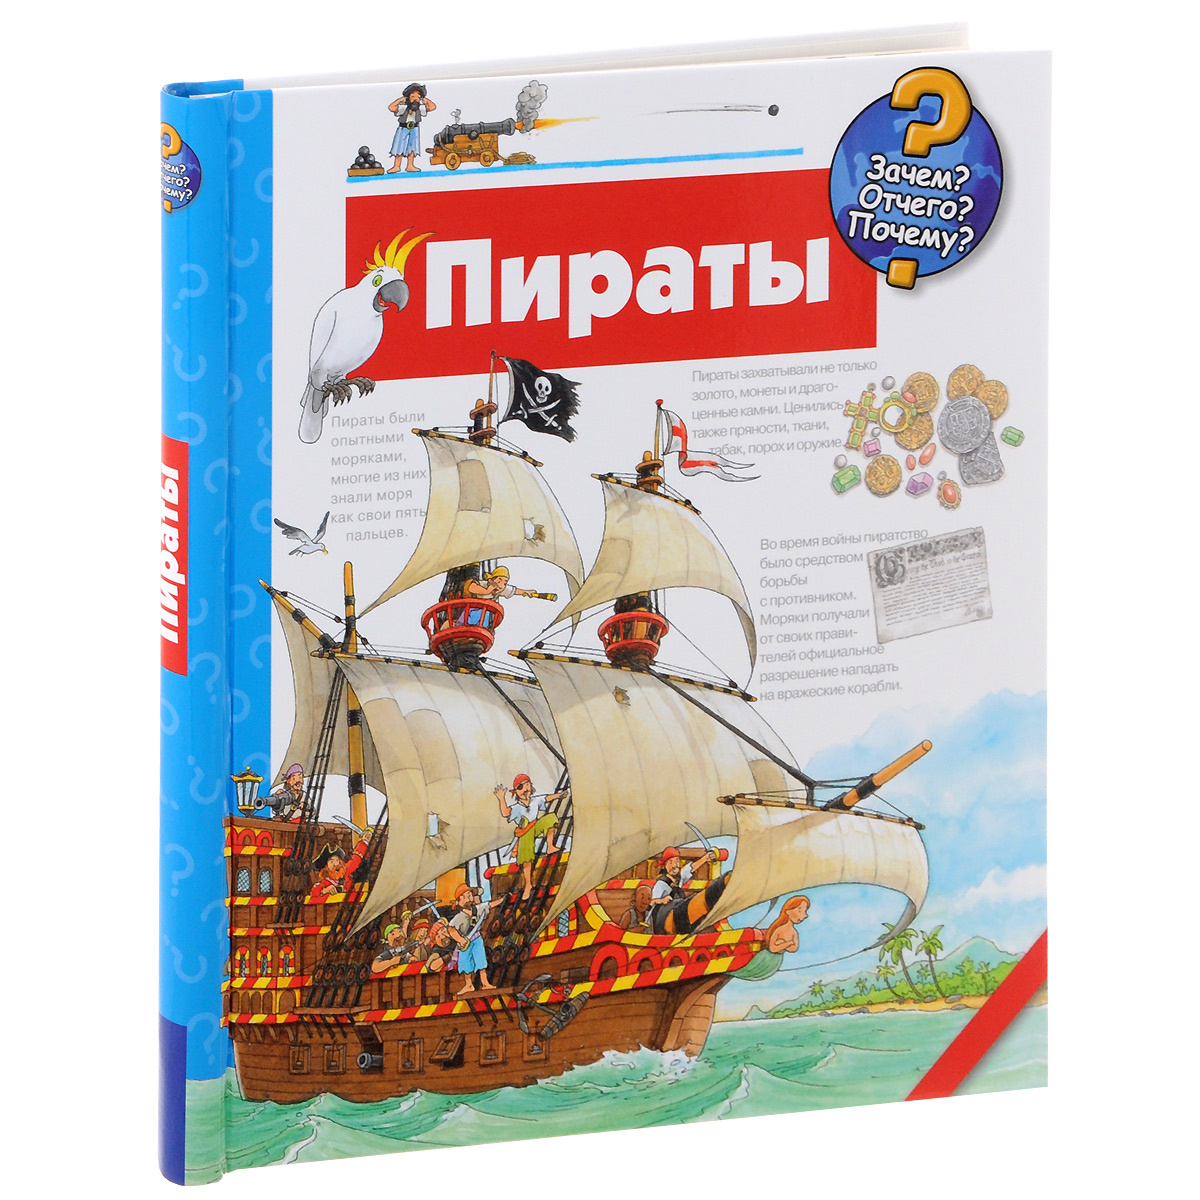 Пираты #1